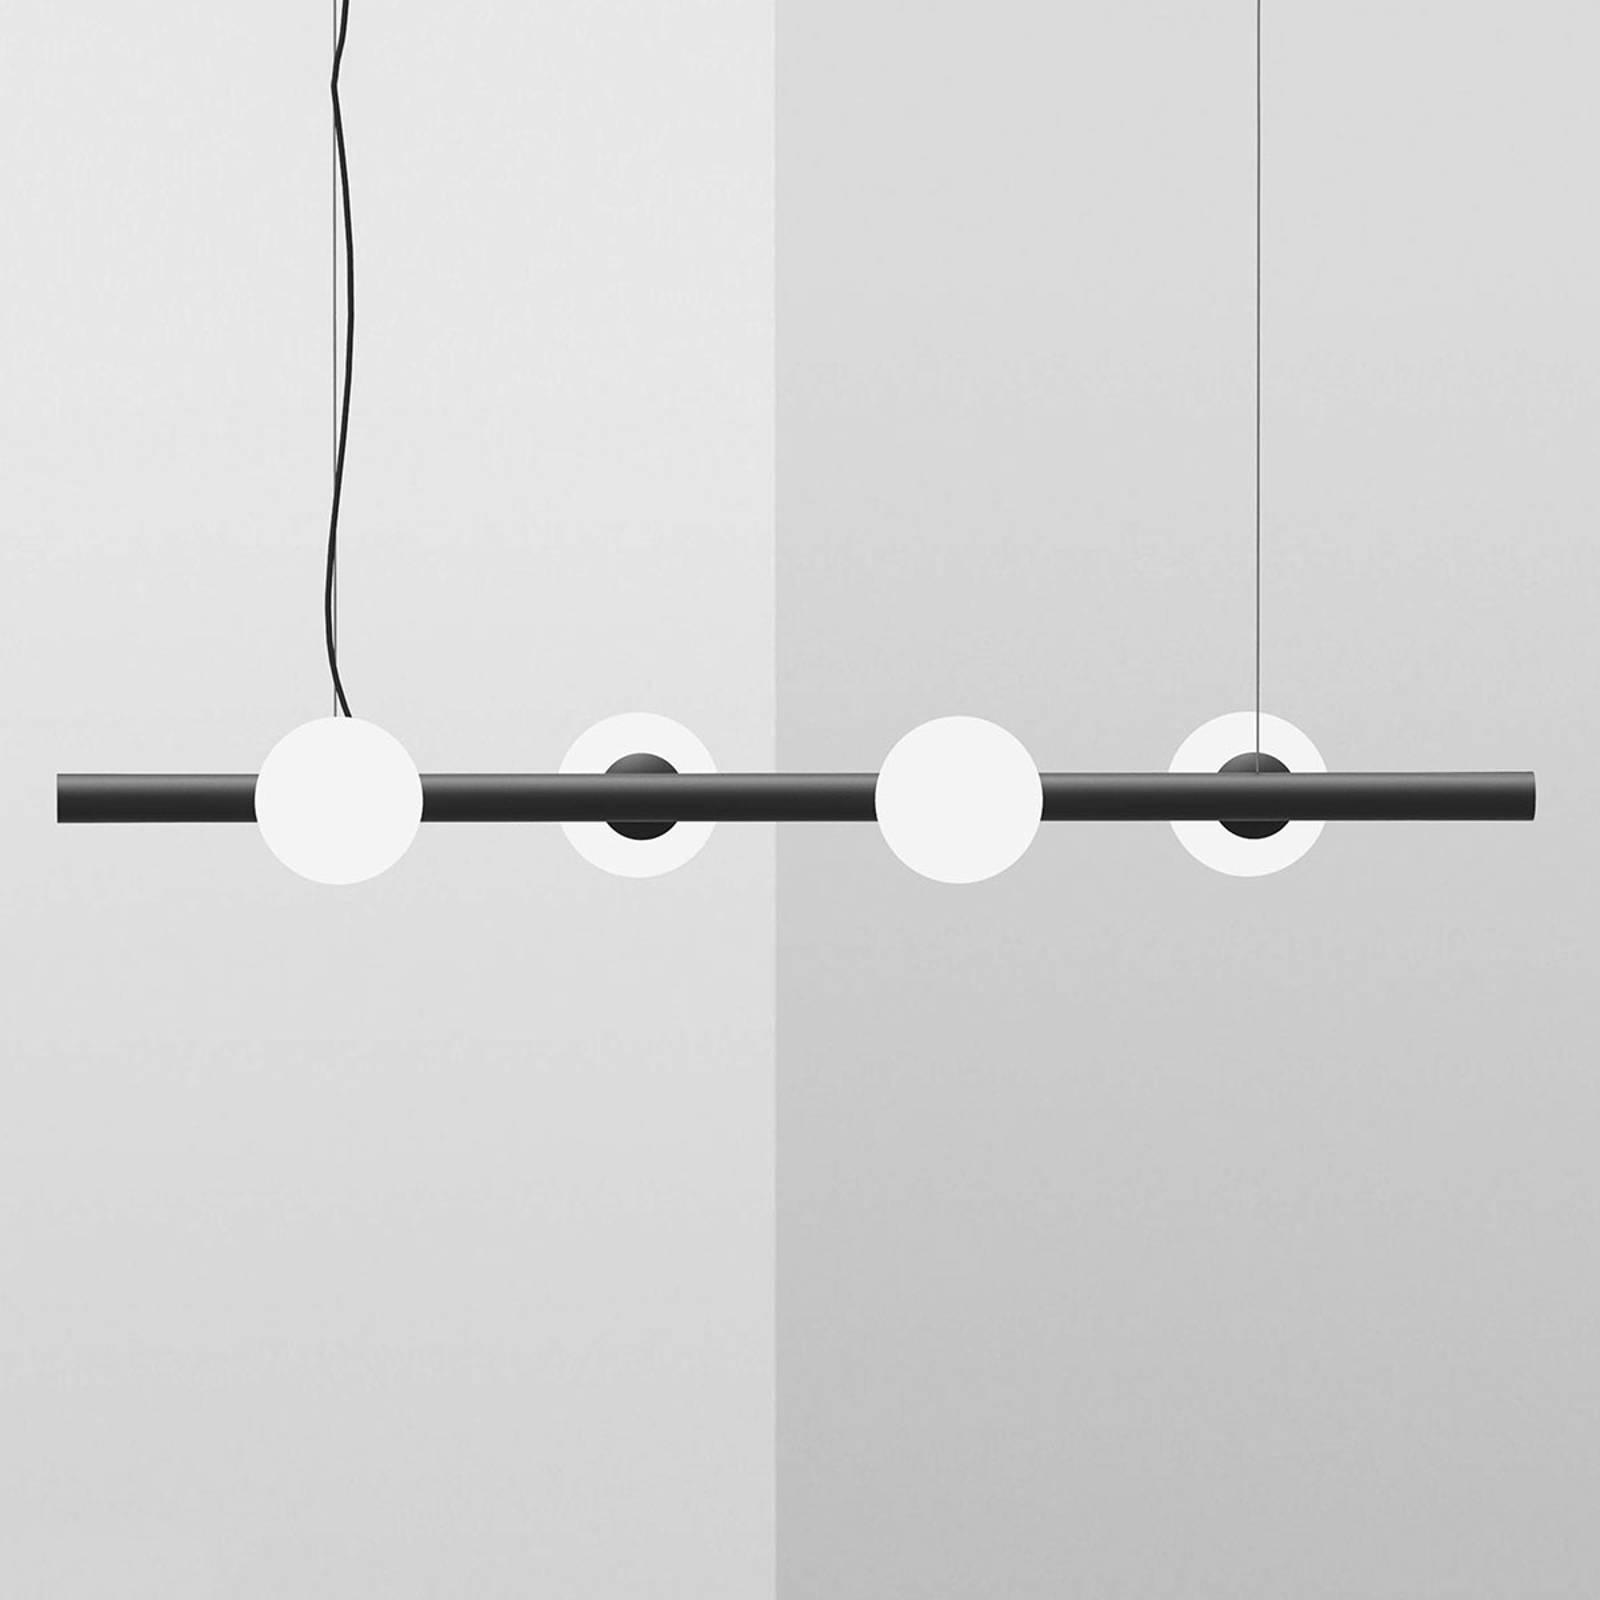 Lampa wisząca Tin Tin 4-punktowa czarna